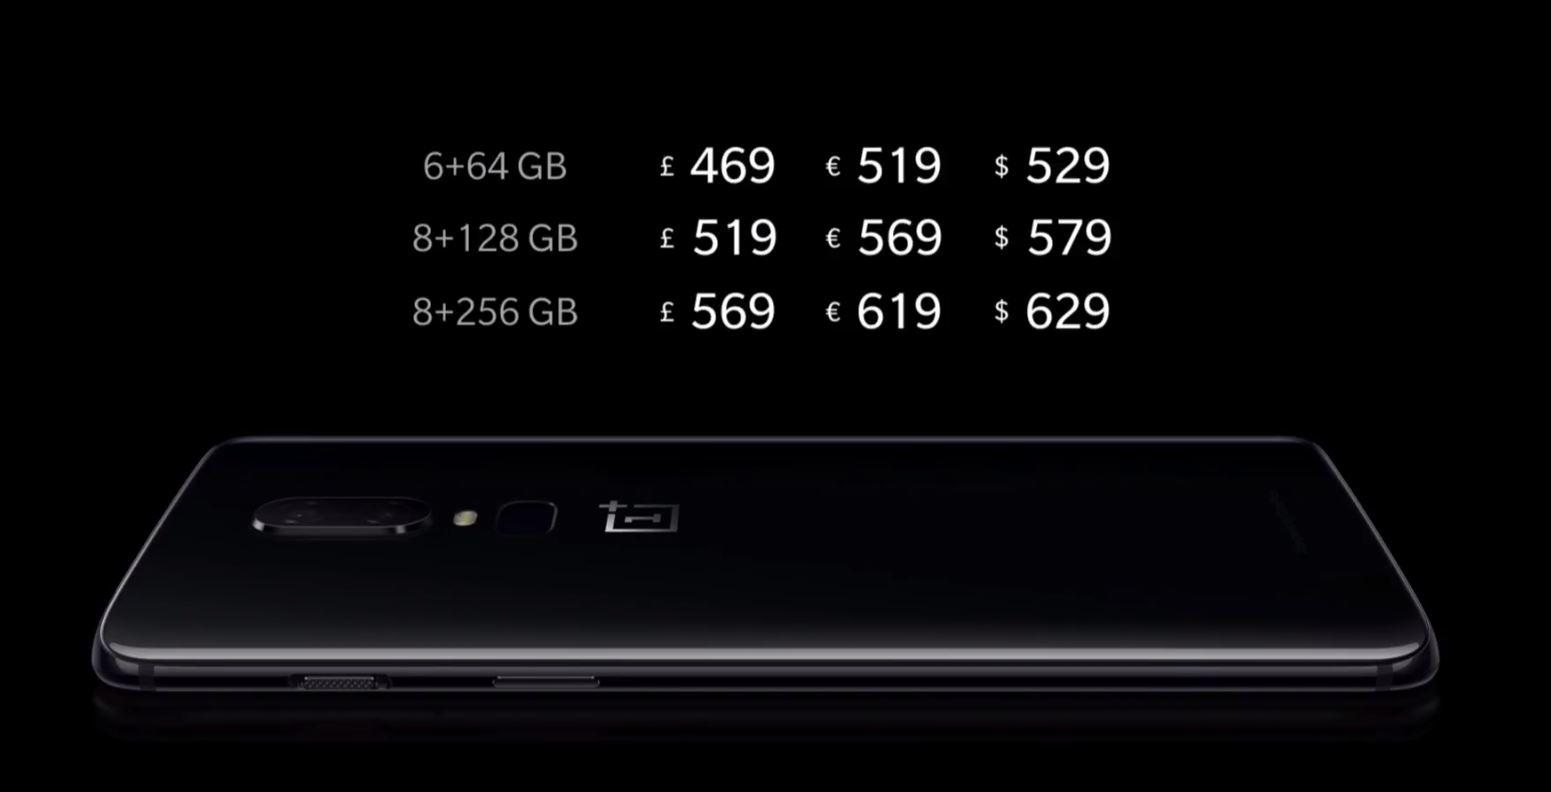 OnePlus-6-Prices.jpg